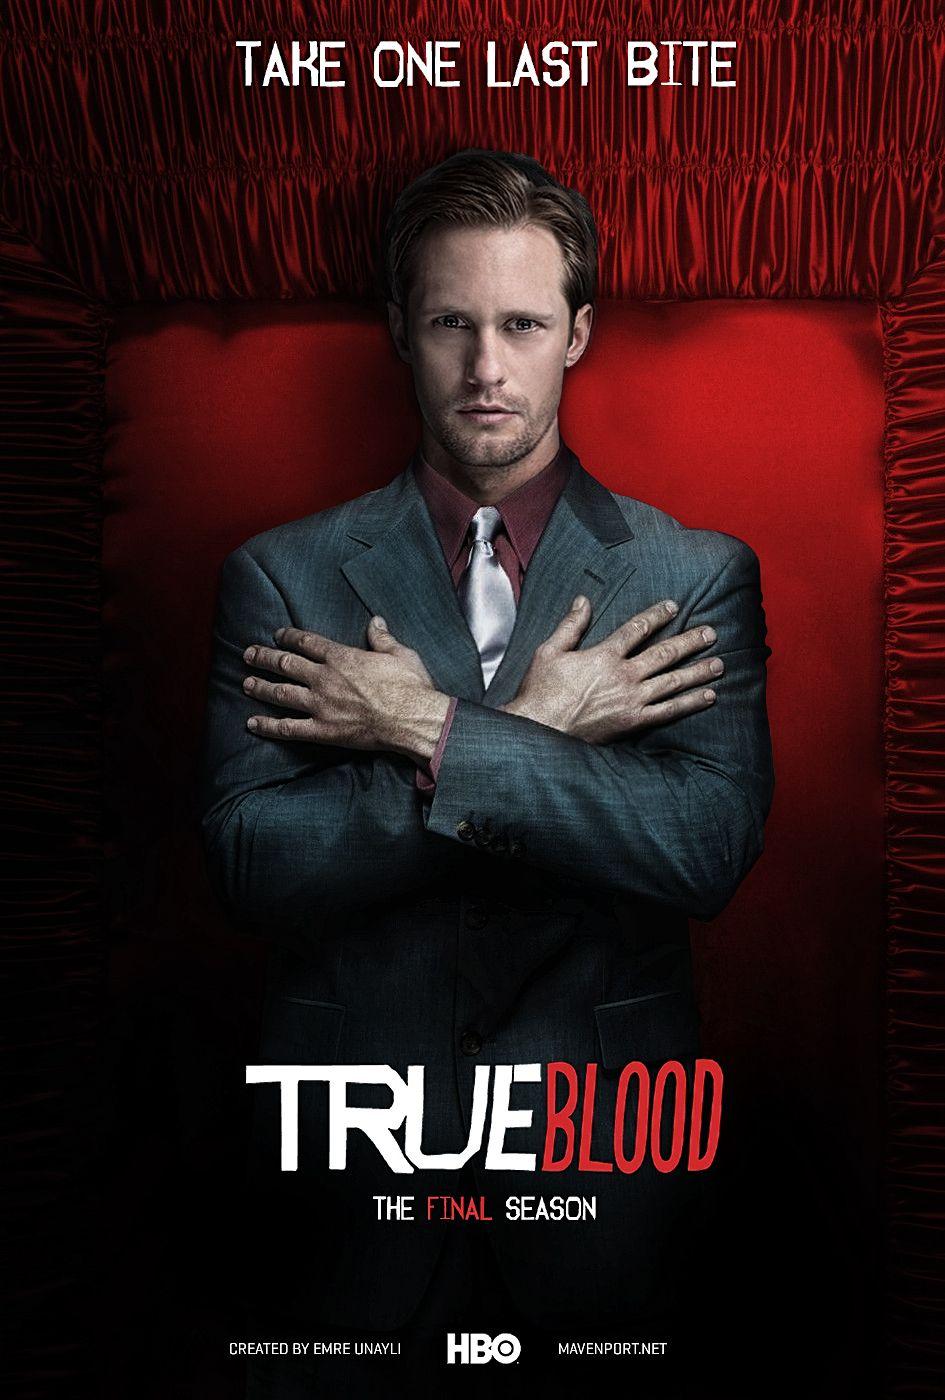 True Blood - The Final Season - Eric Northman - 'Take One Last Bite'